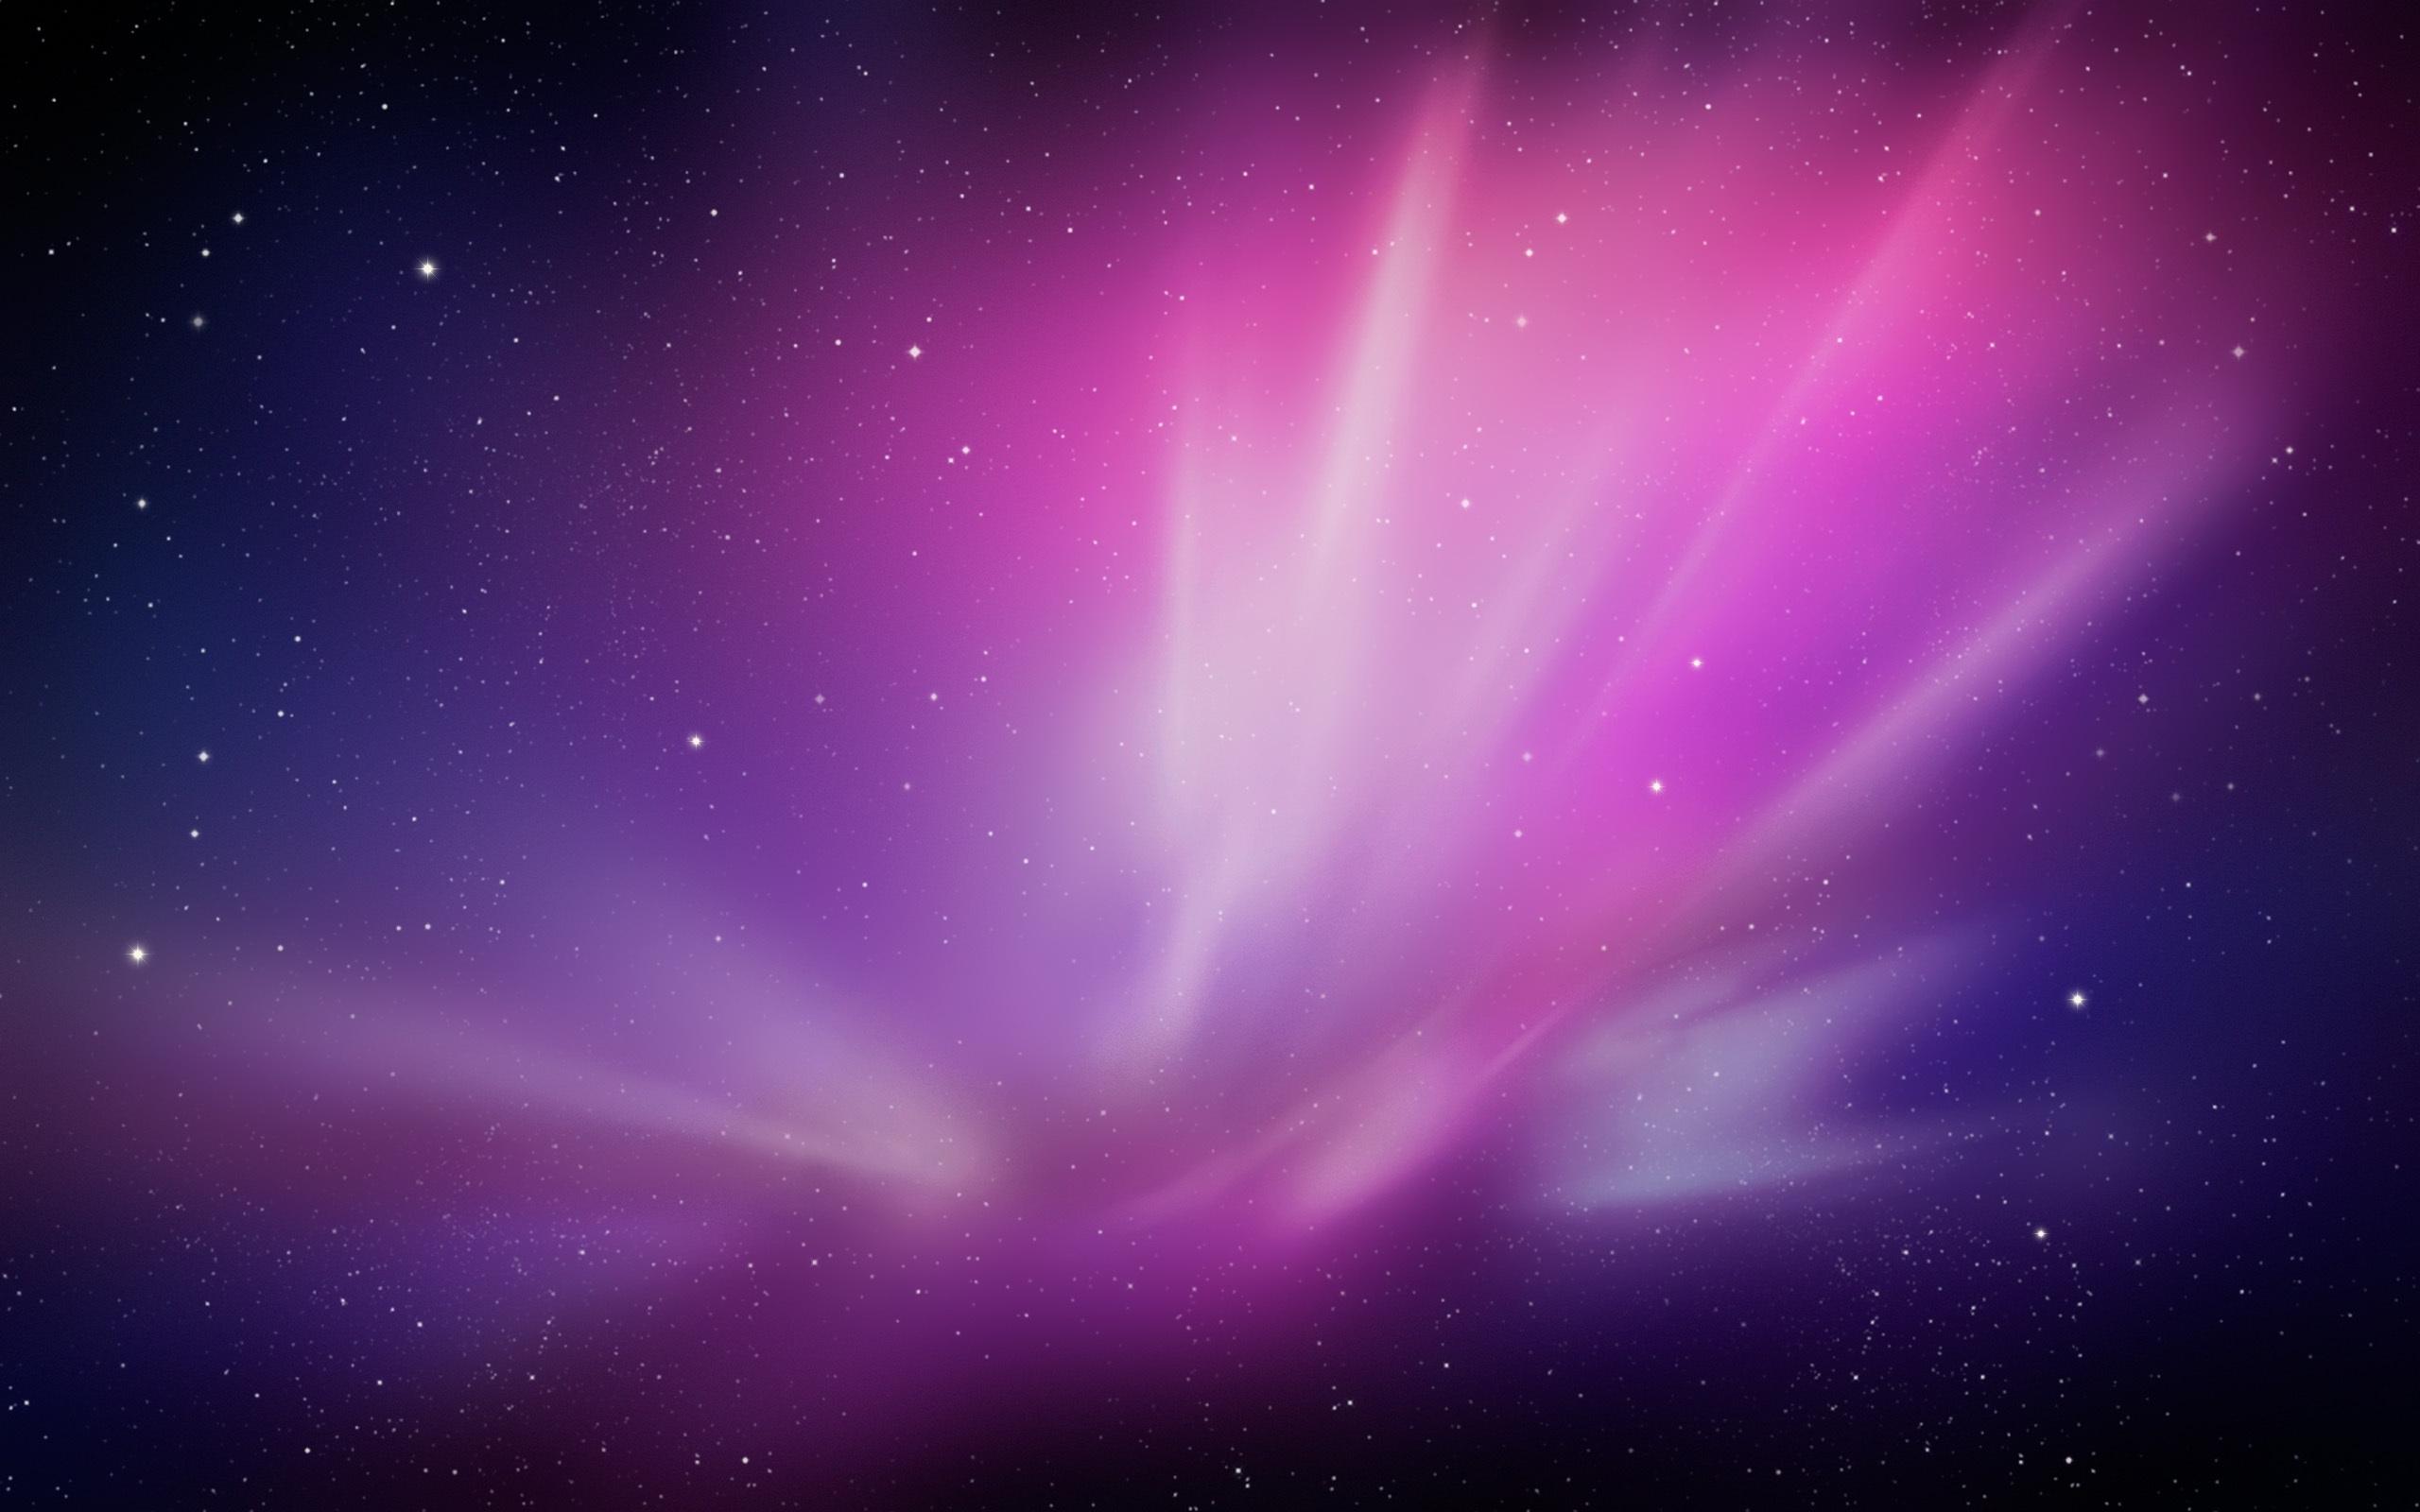 10 new pink galaxy background tumblr full hd 1920 1080 for pc desktop 2019 - Cool galaxy wallpaper ...